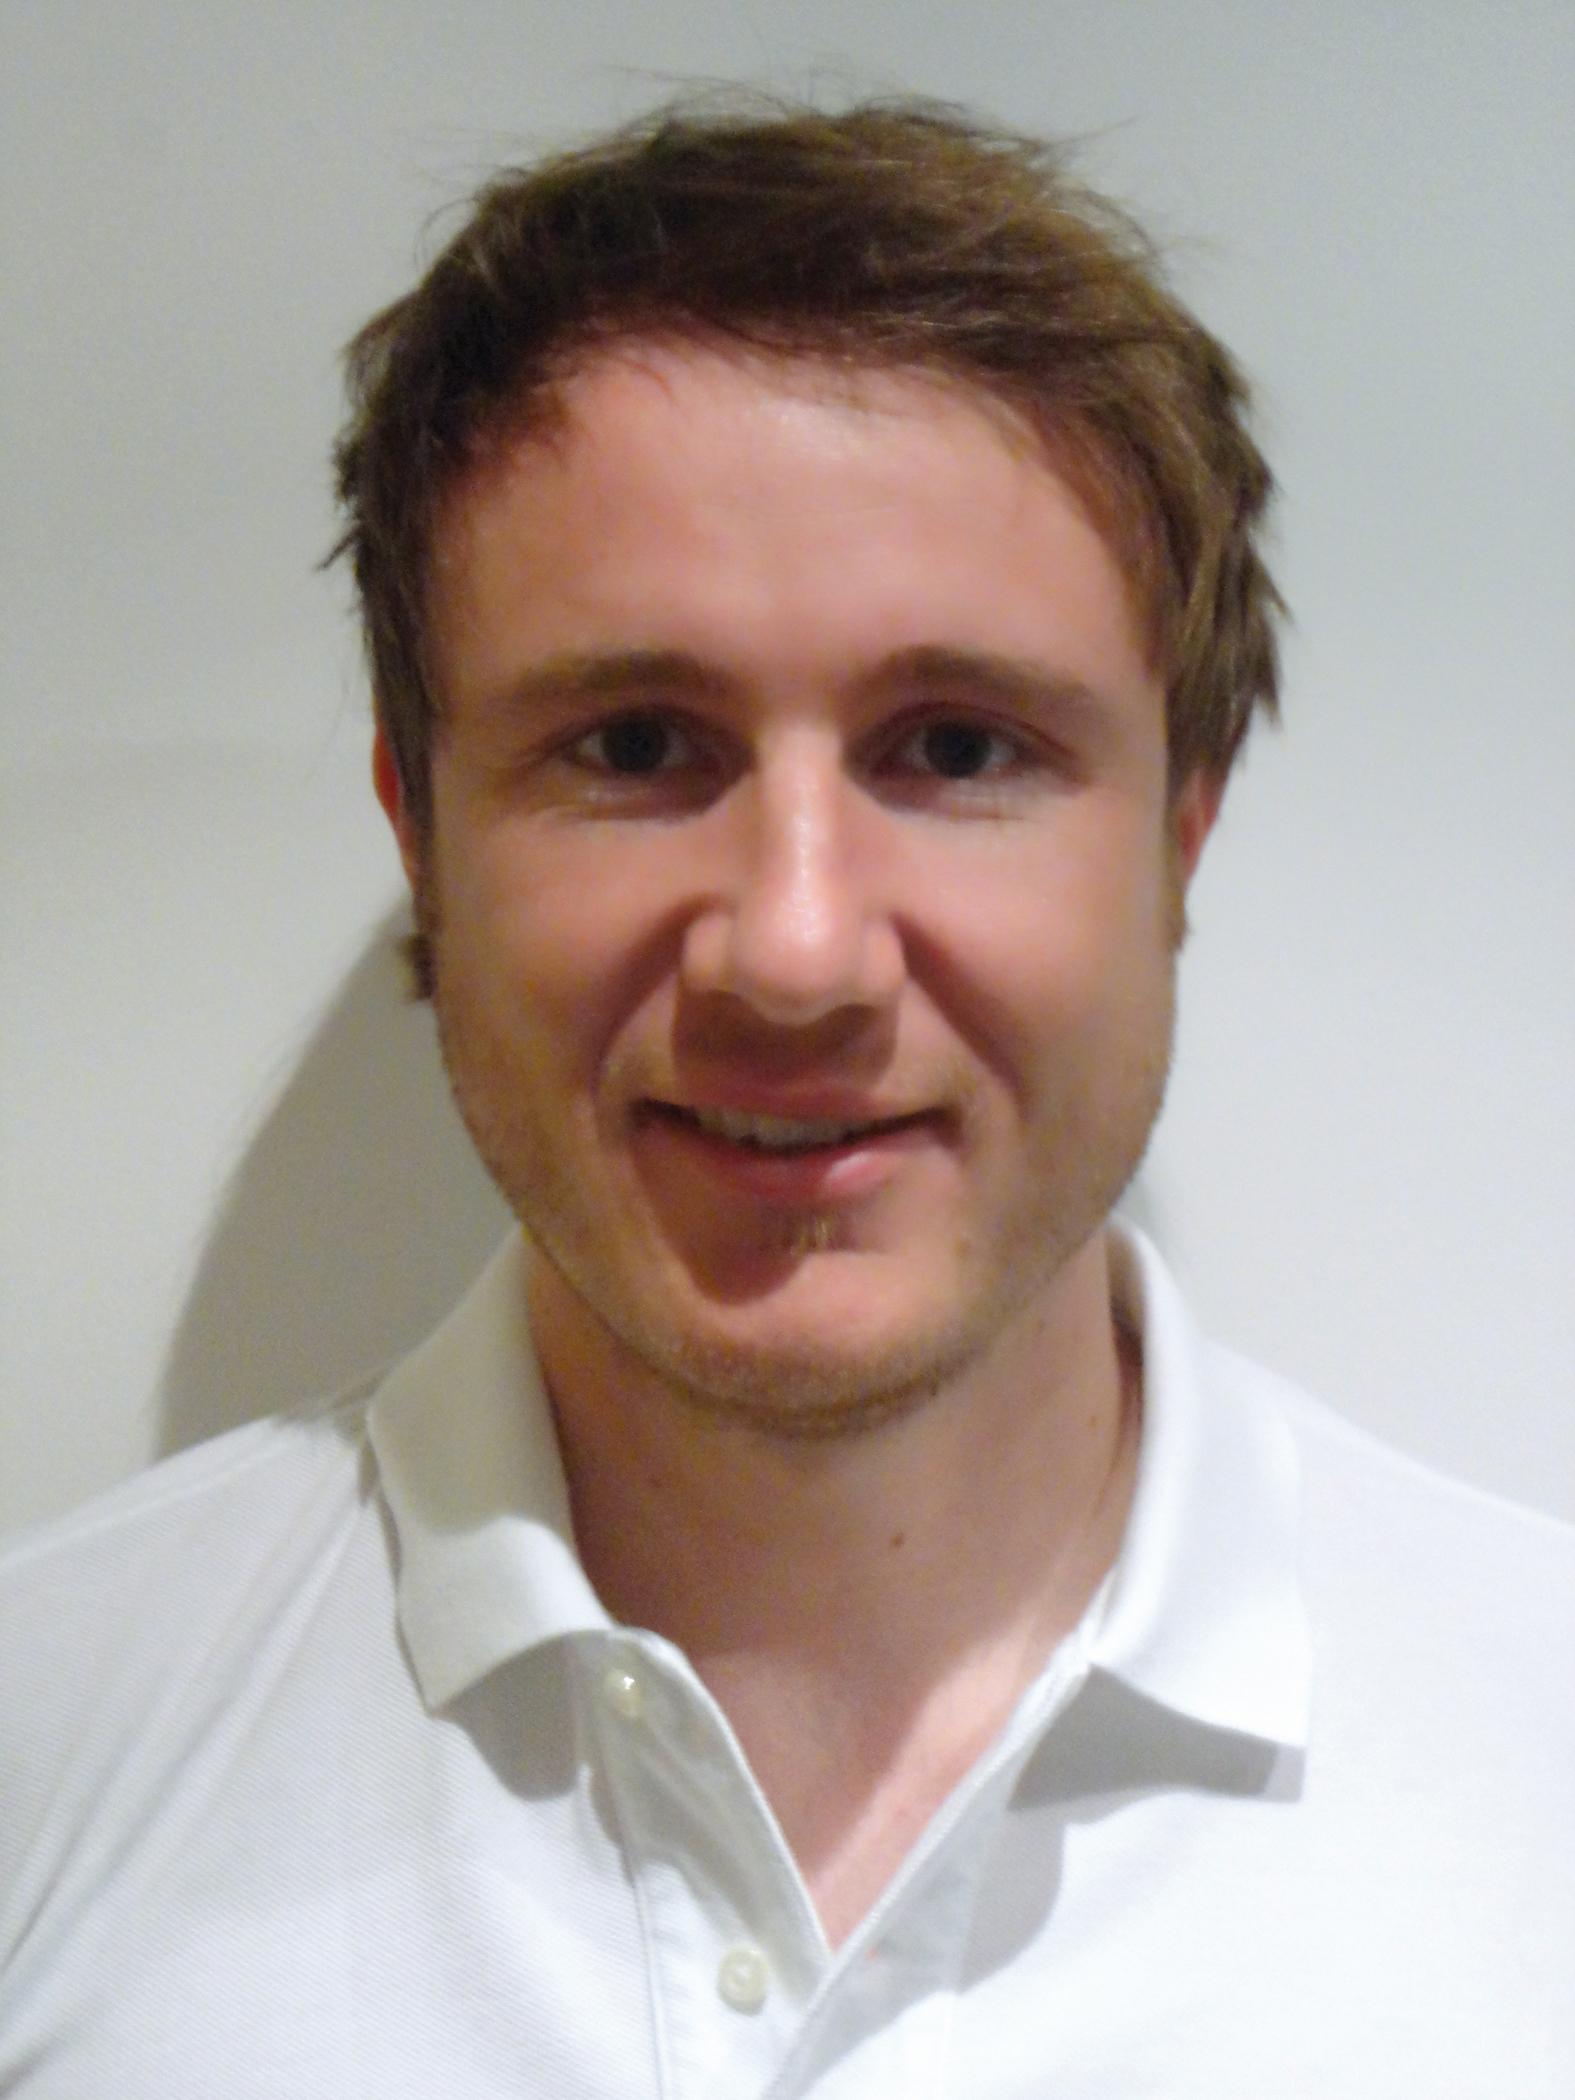 Stefan Oberhauser Präsident Sport / Organisation +43 664 837 0292 - stefan_oberhauser